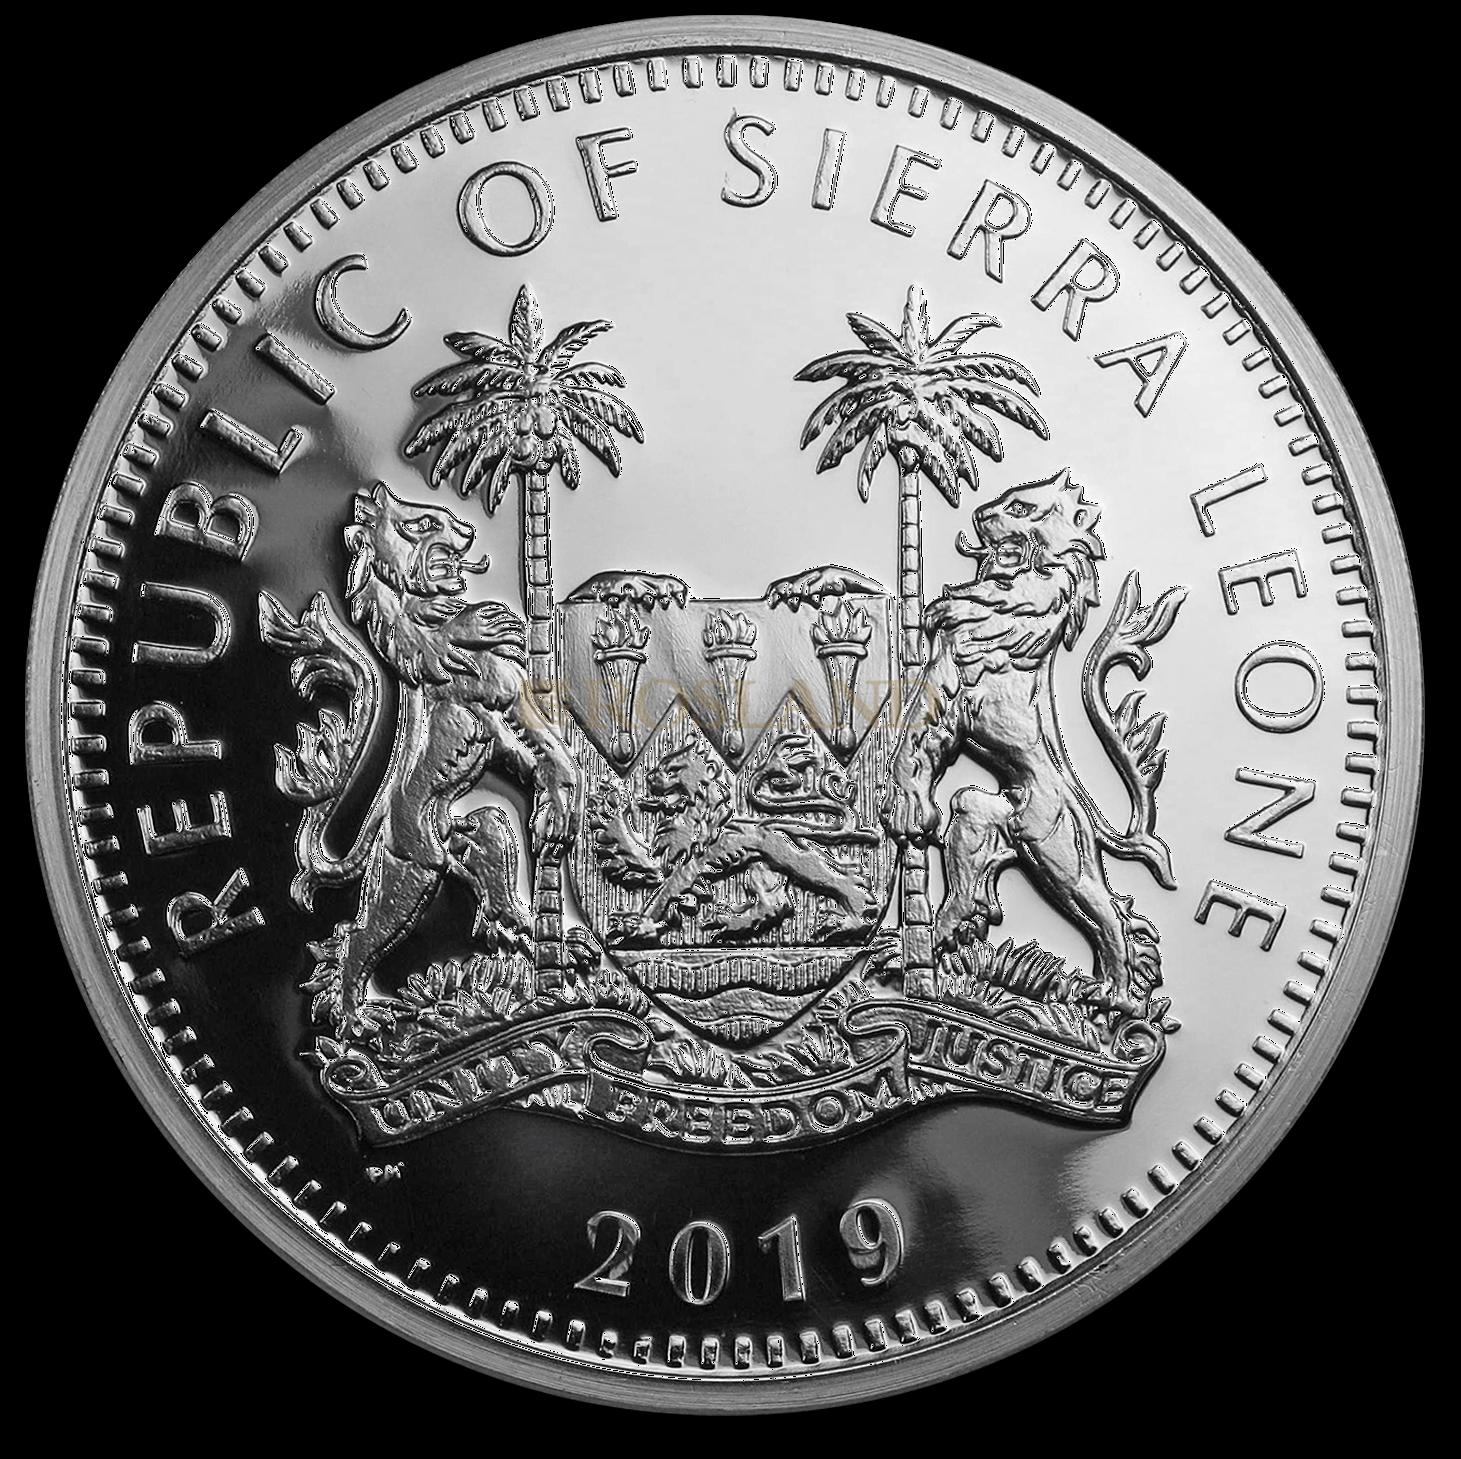 2 Unzen Silbermünze Sierra Leone Buffalo 2019 PCGS PR-69 (DCAM, HR, Shield)